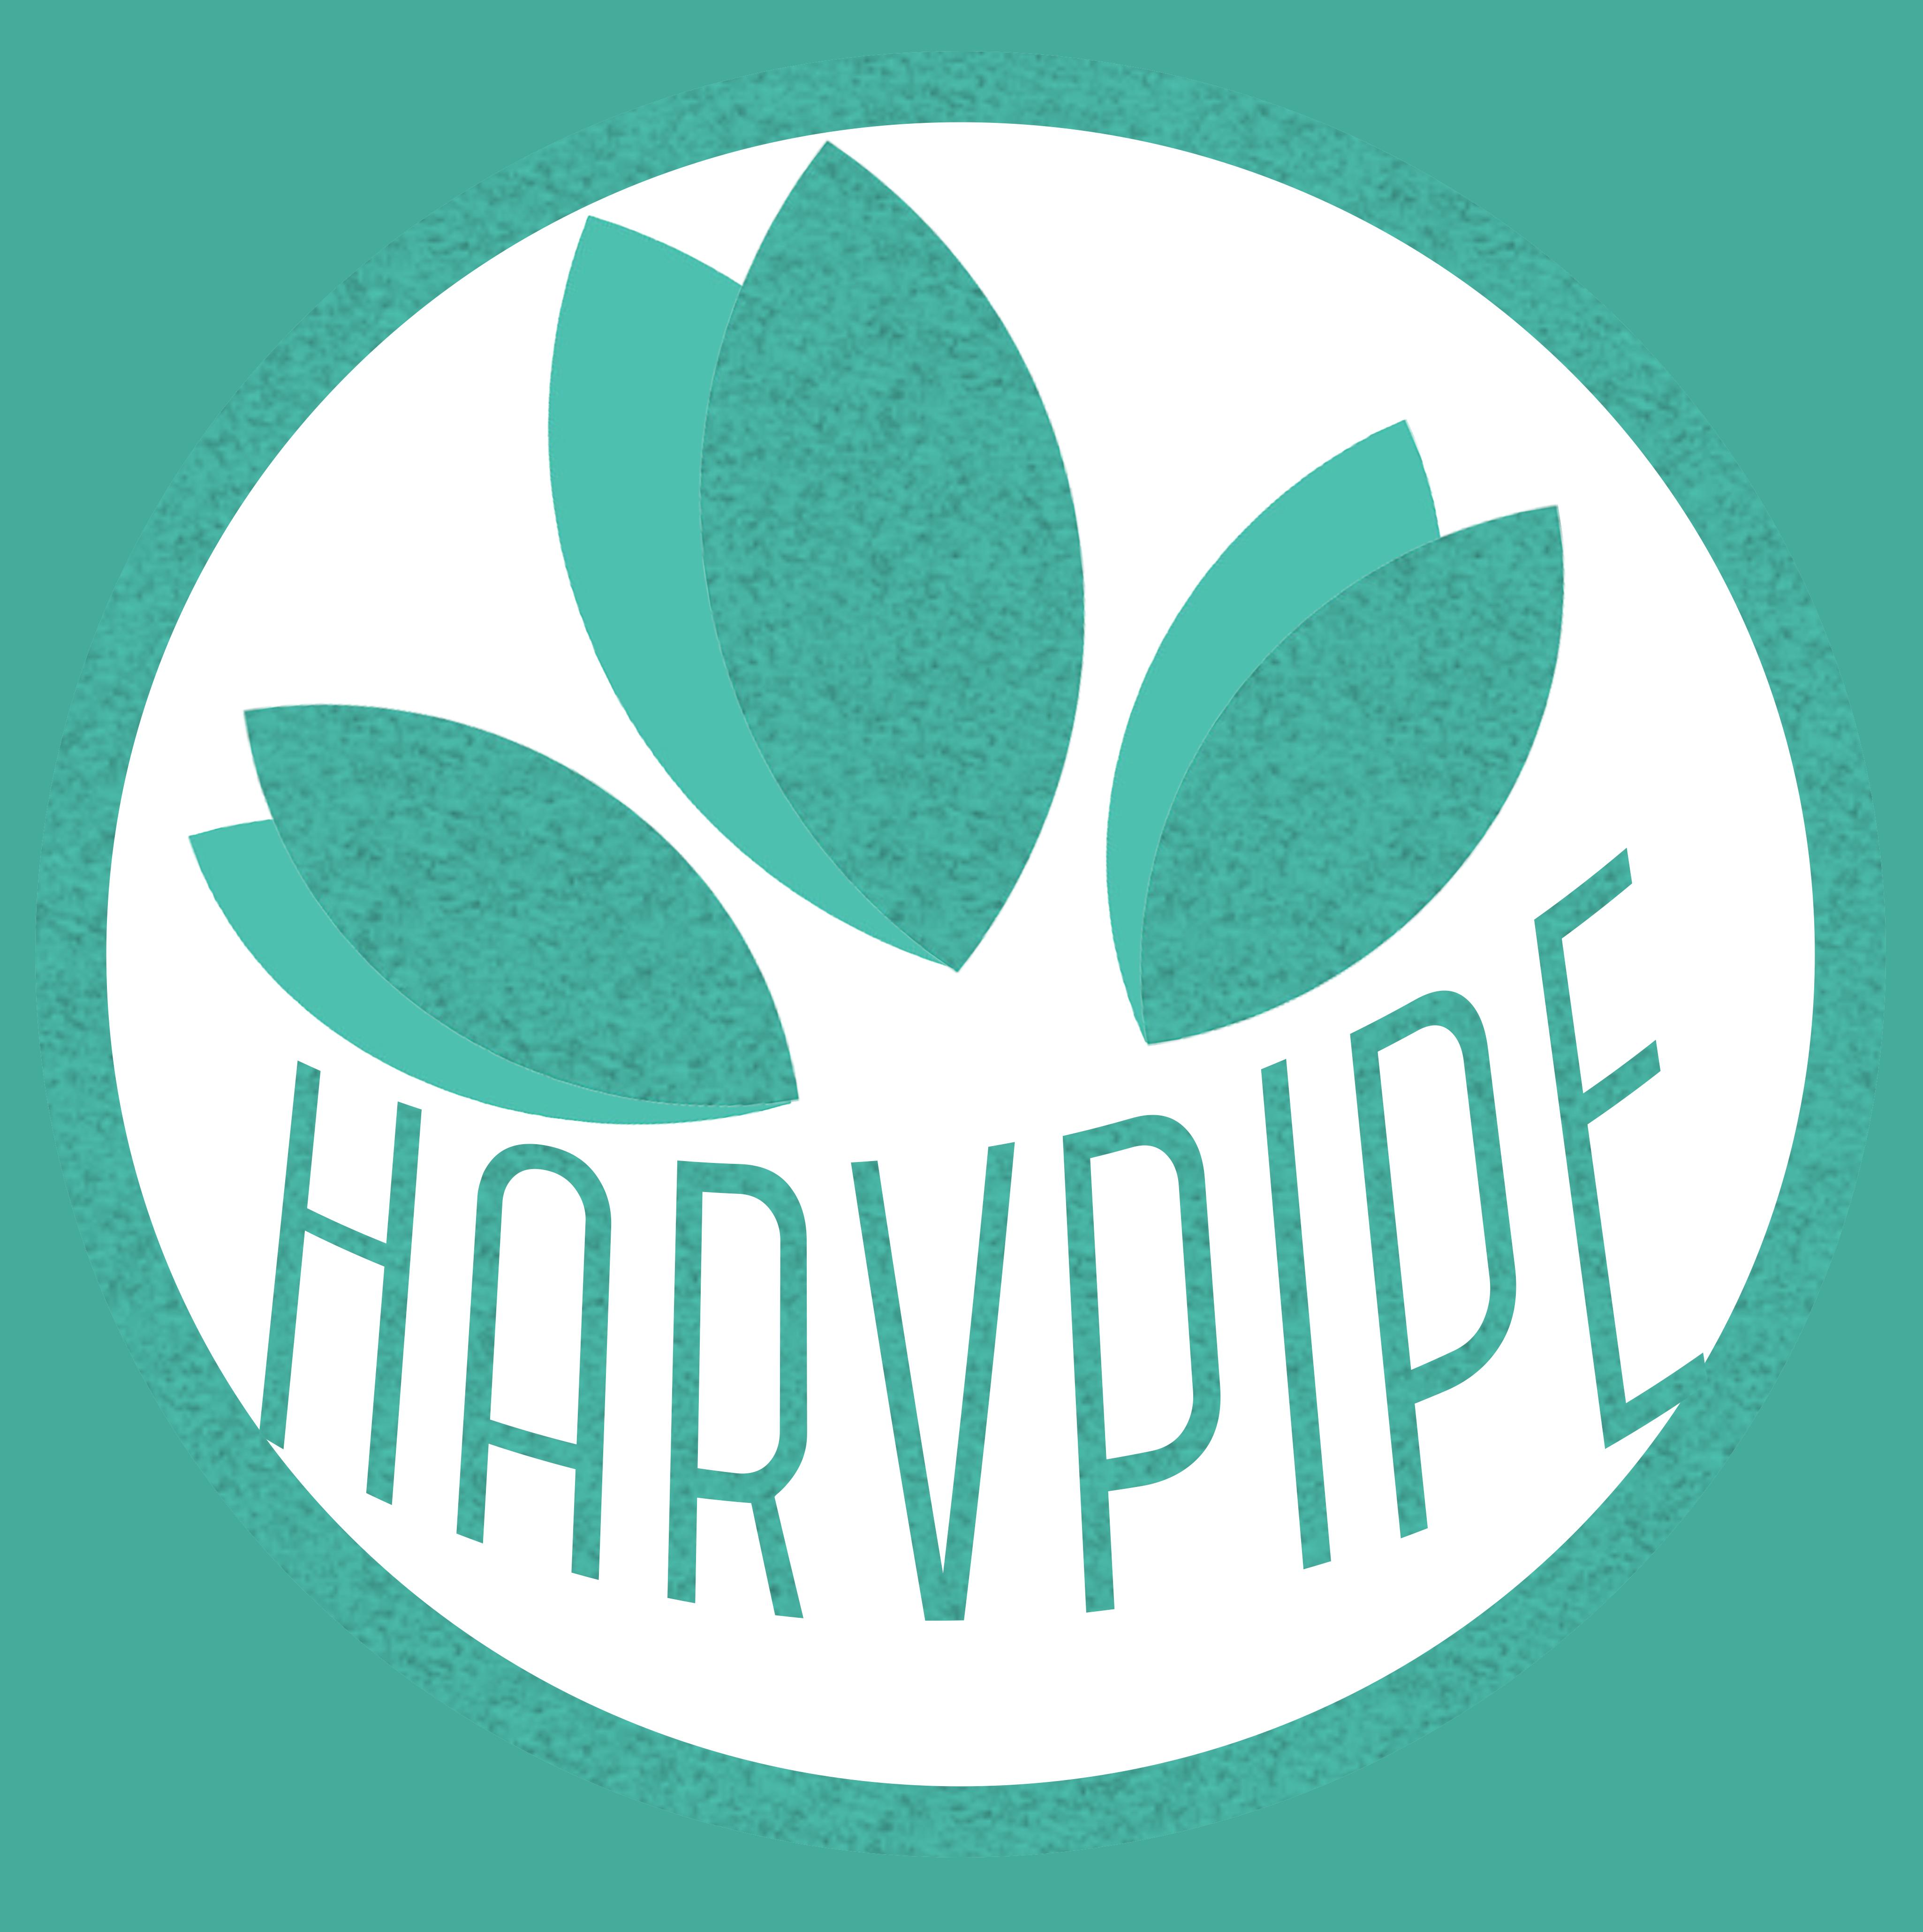 HarvPipe